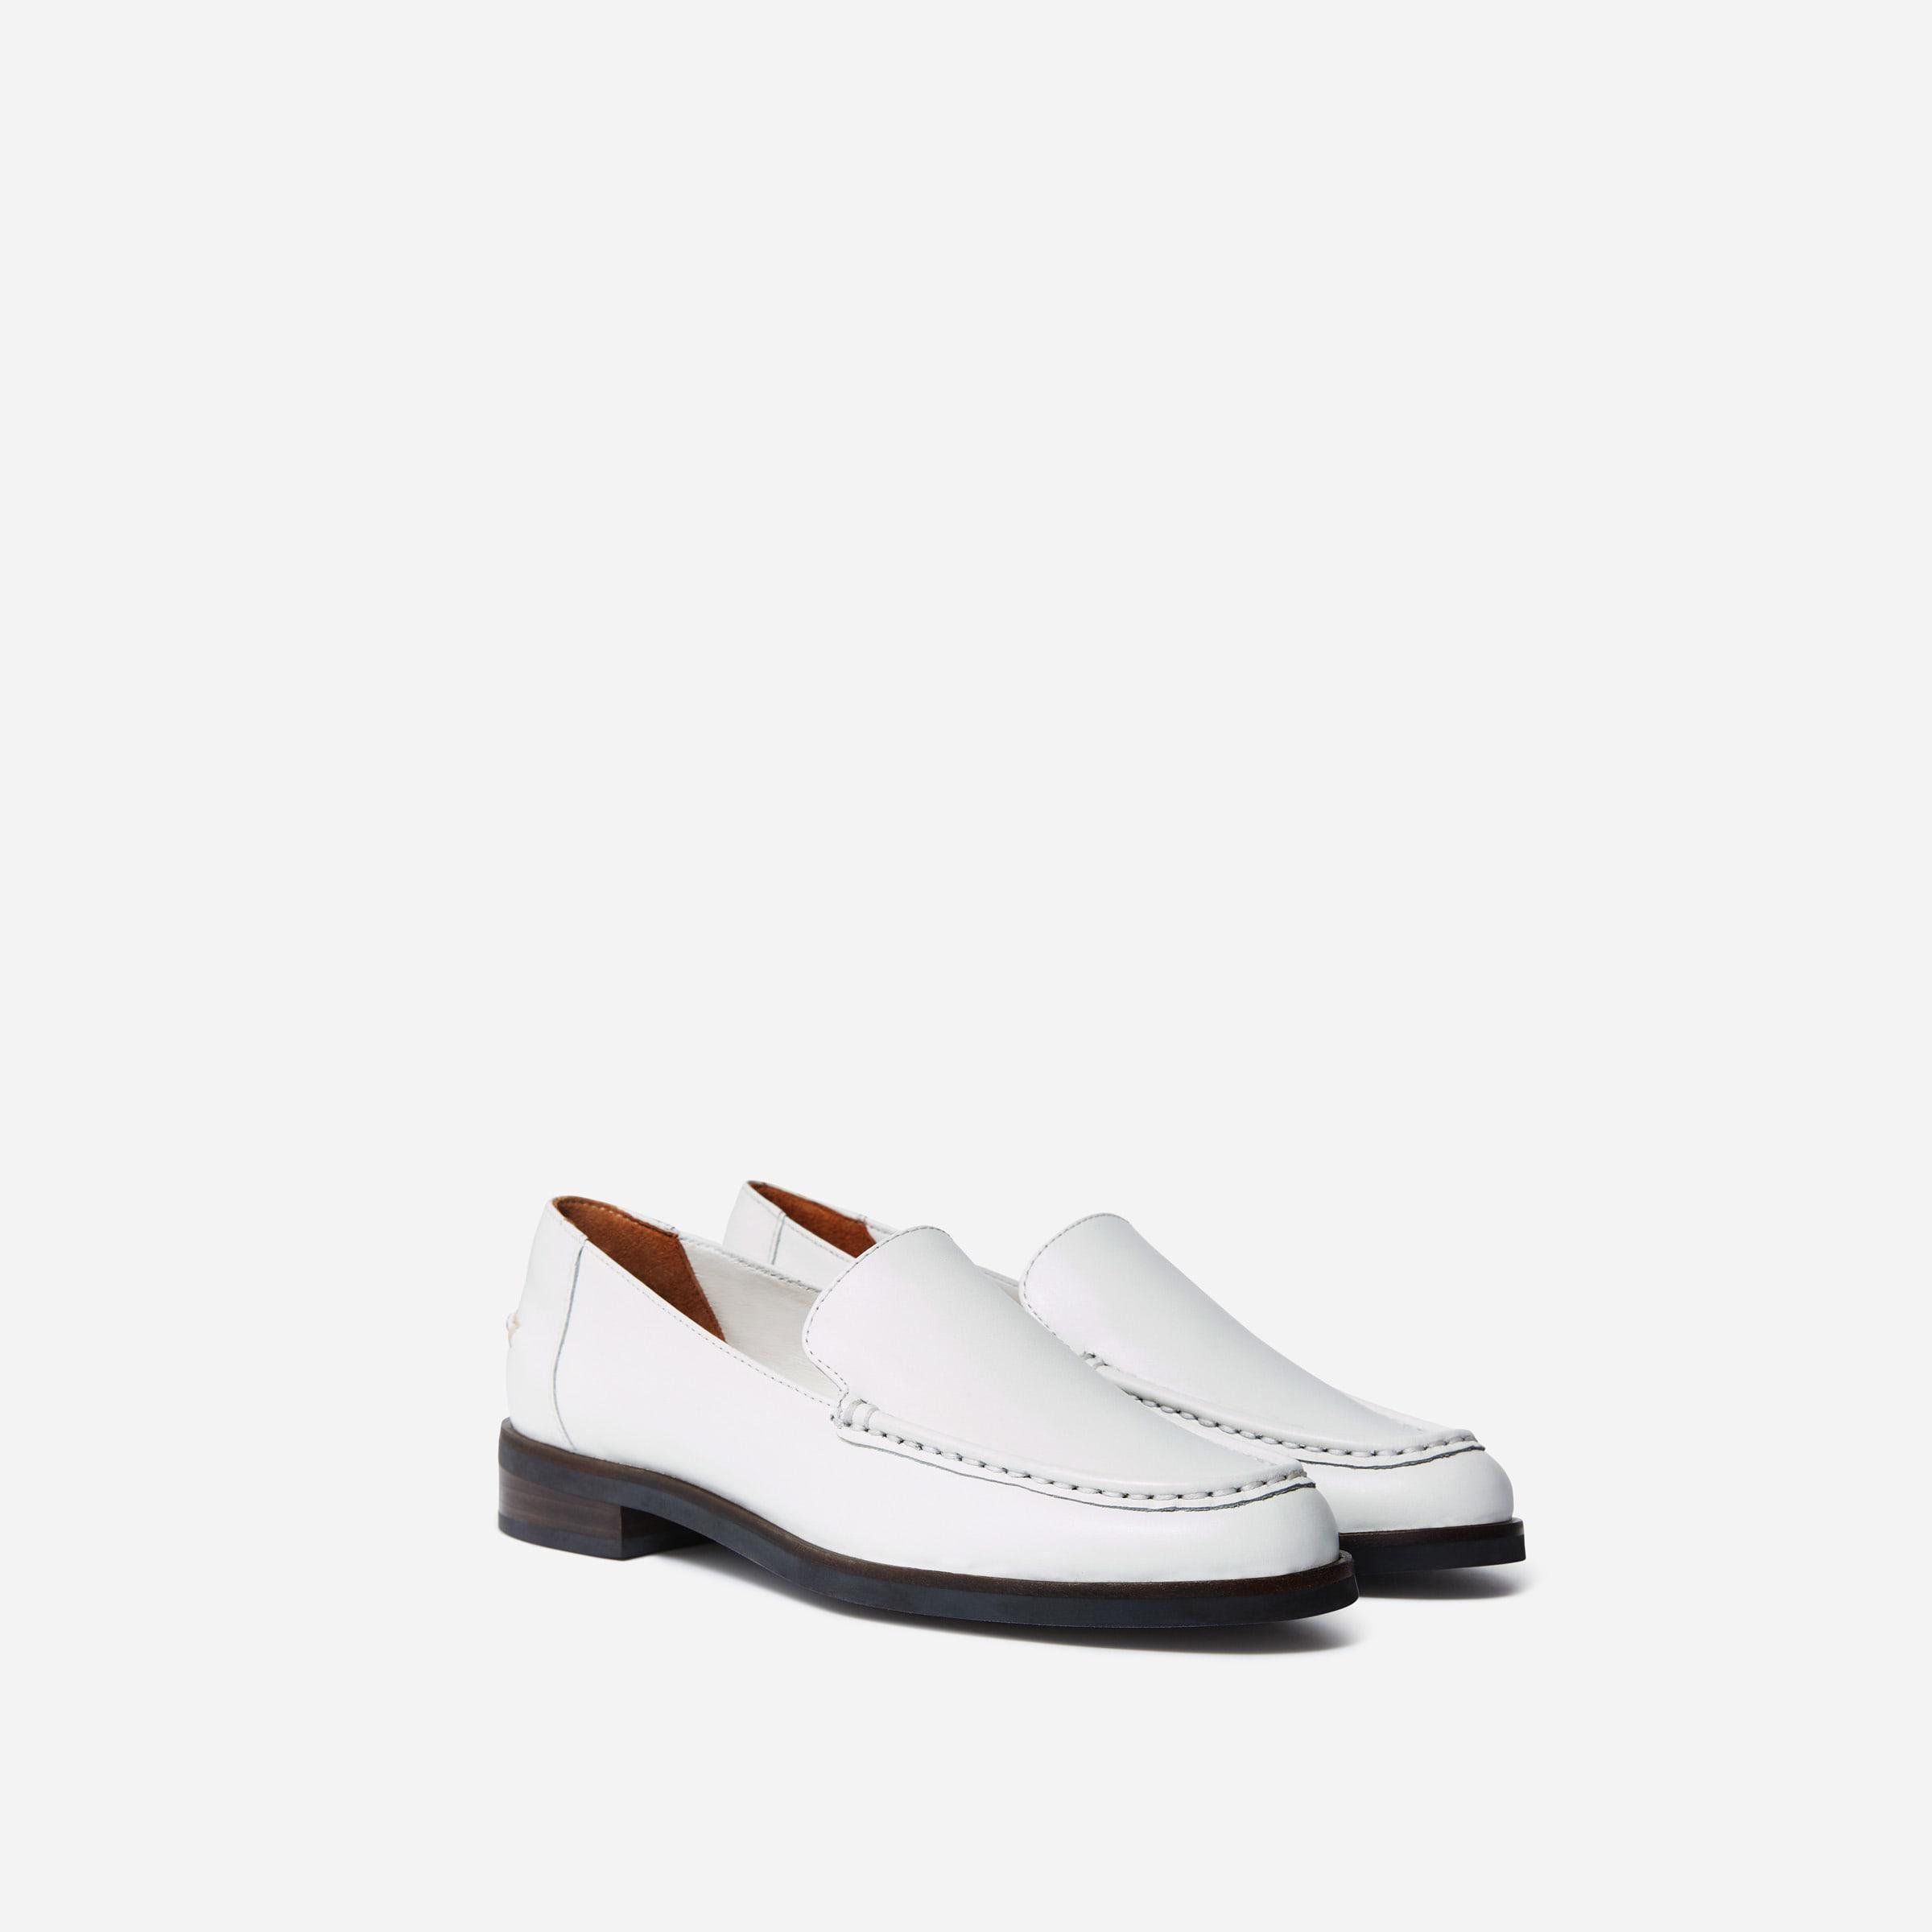 The Modern Loafer